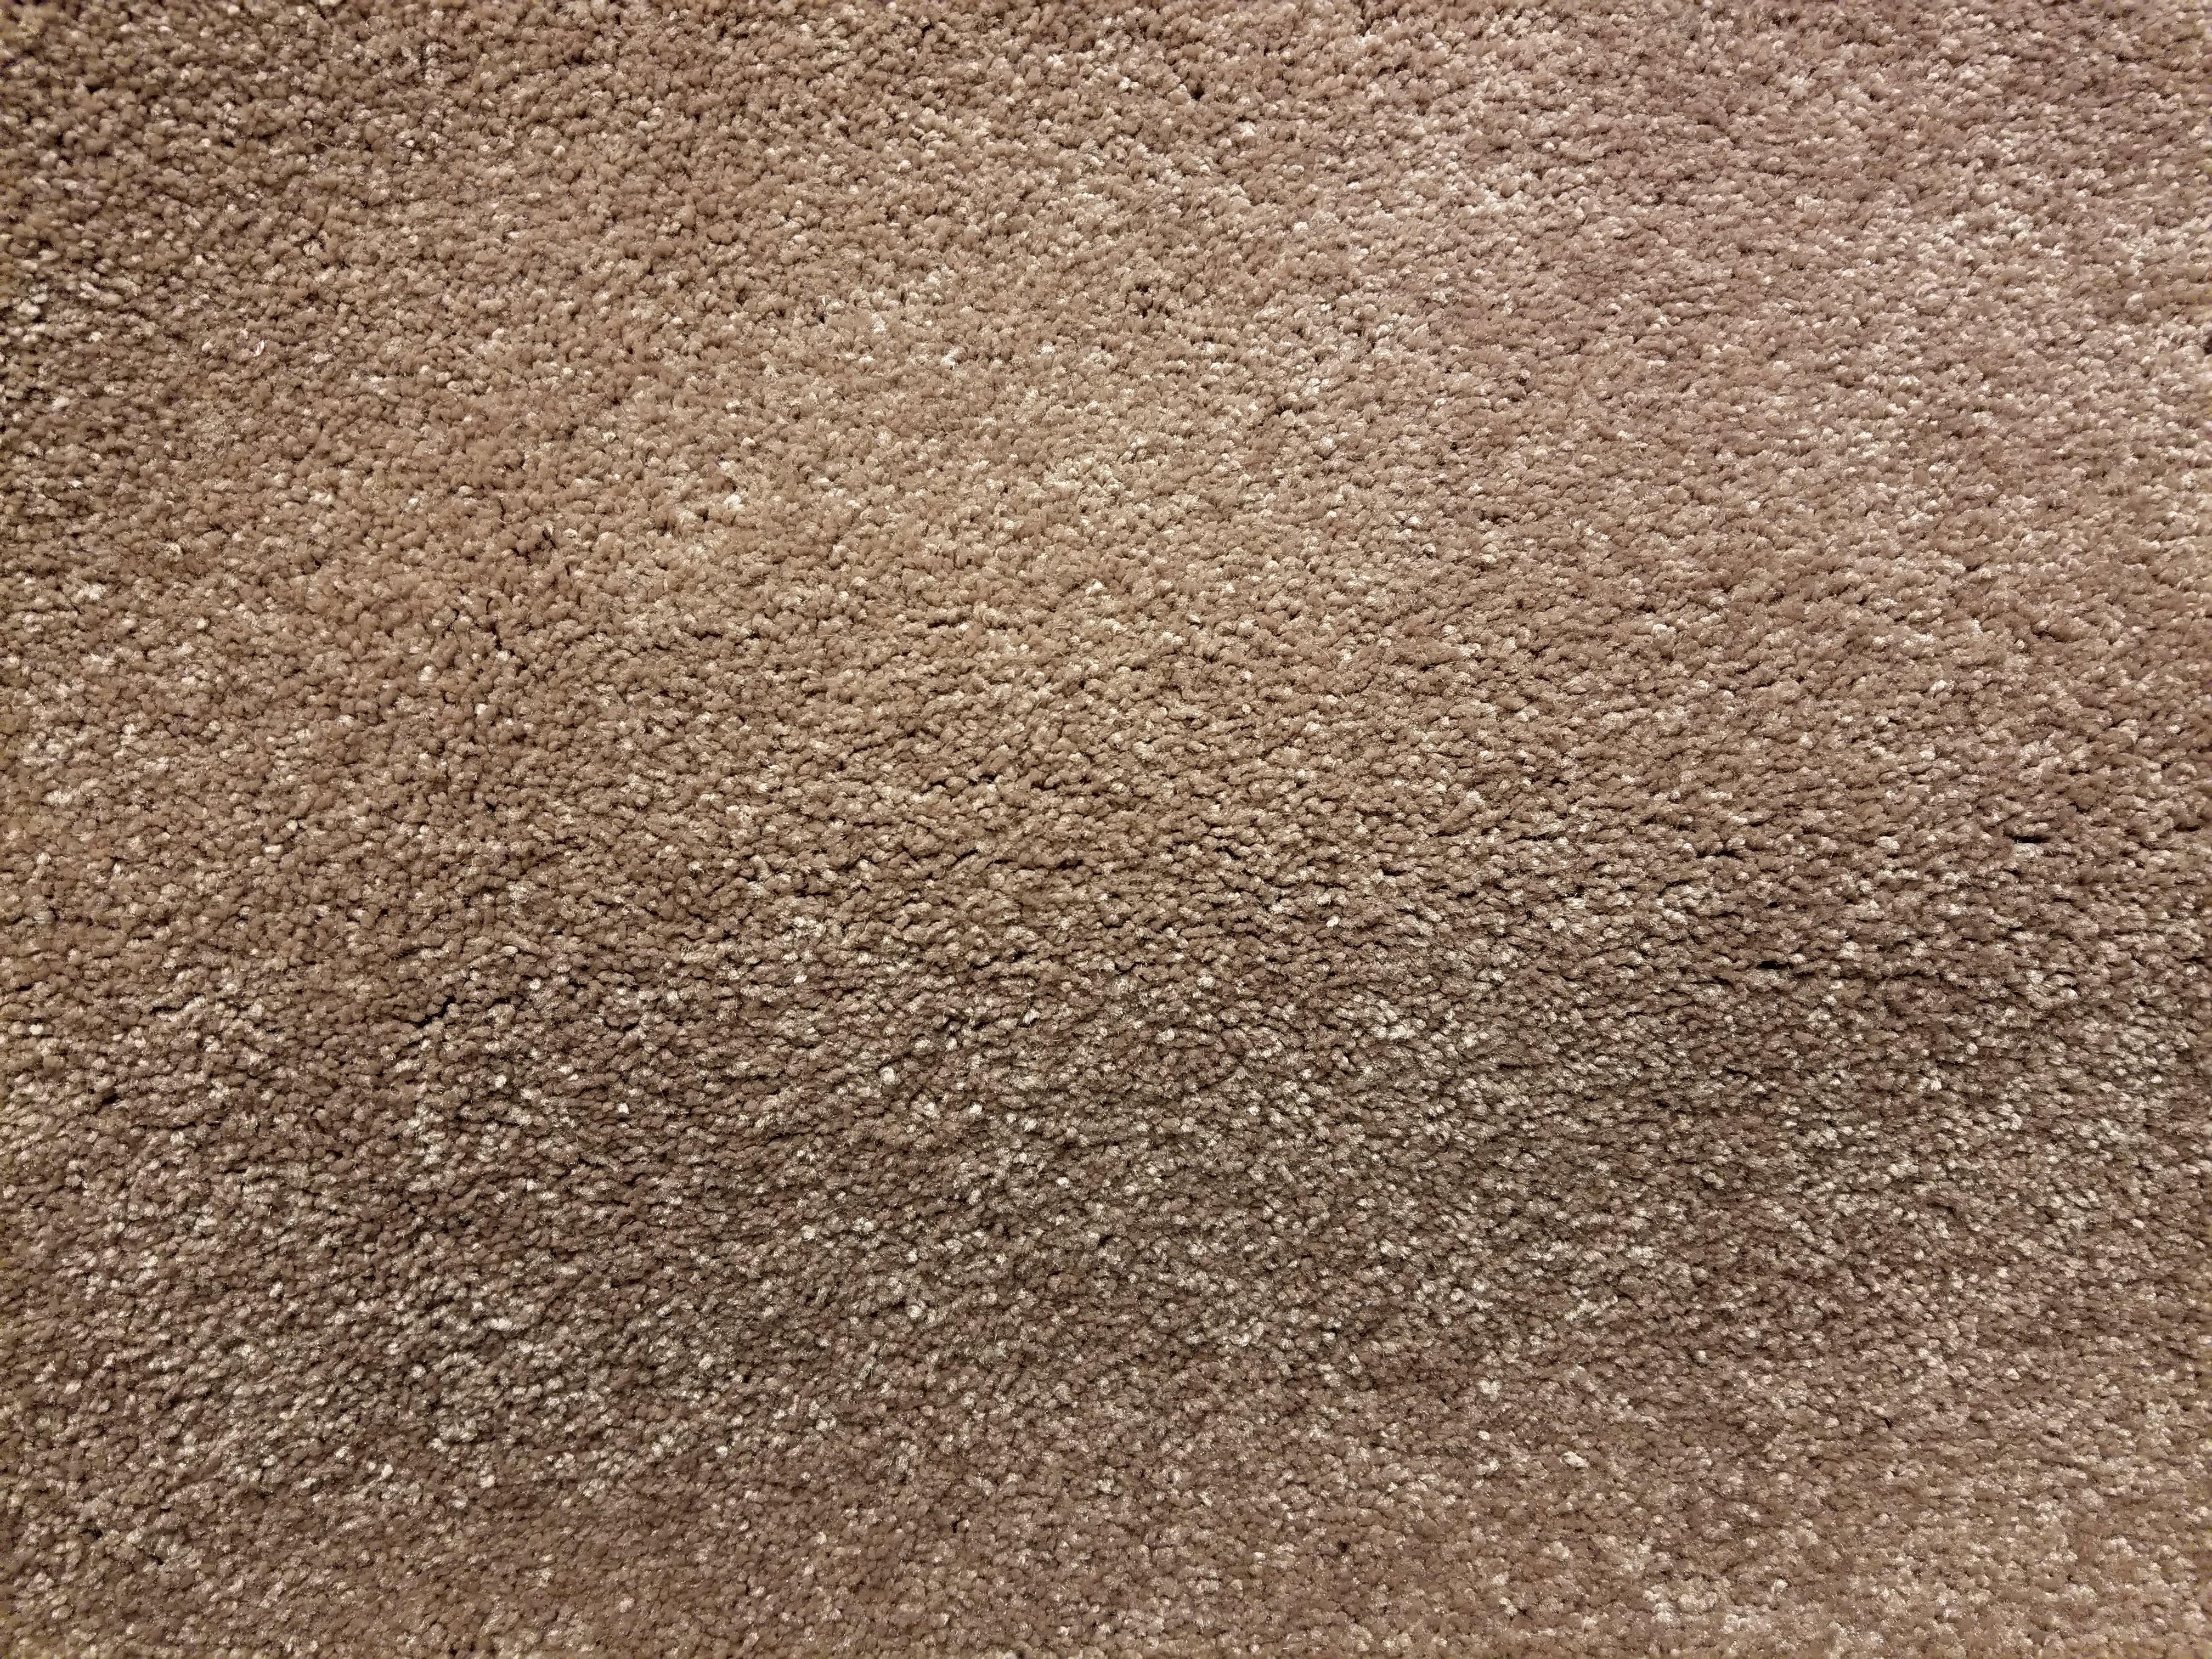 Mohawk Carpet - Serene Sierra in color Cedar Shingles - 75oz Everstrand PET - 12' Wide - In Stock Clearance